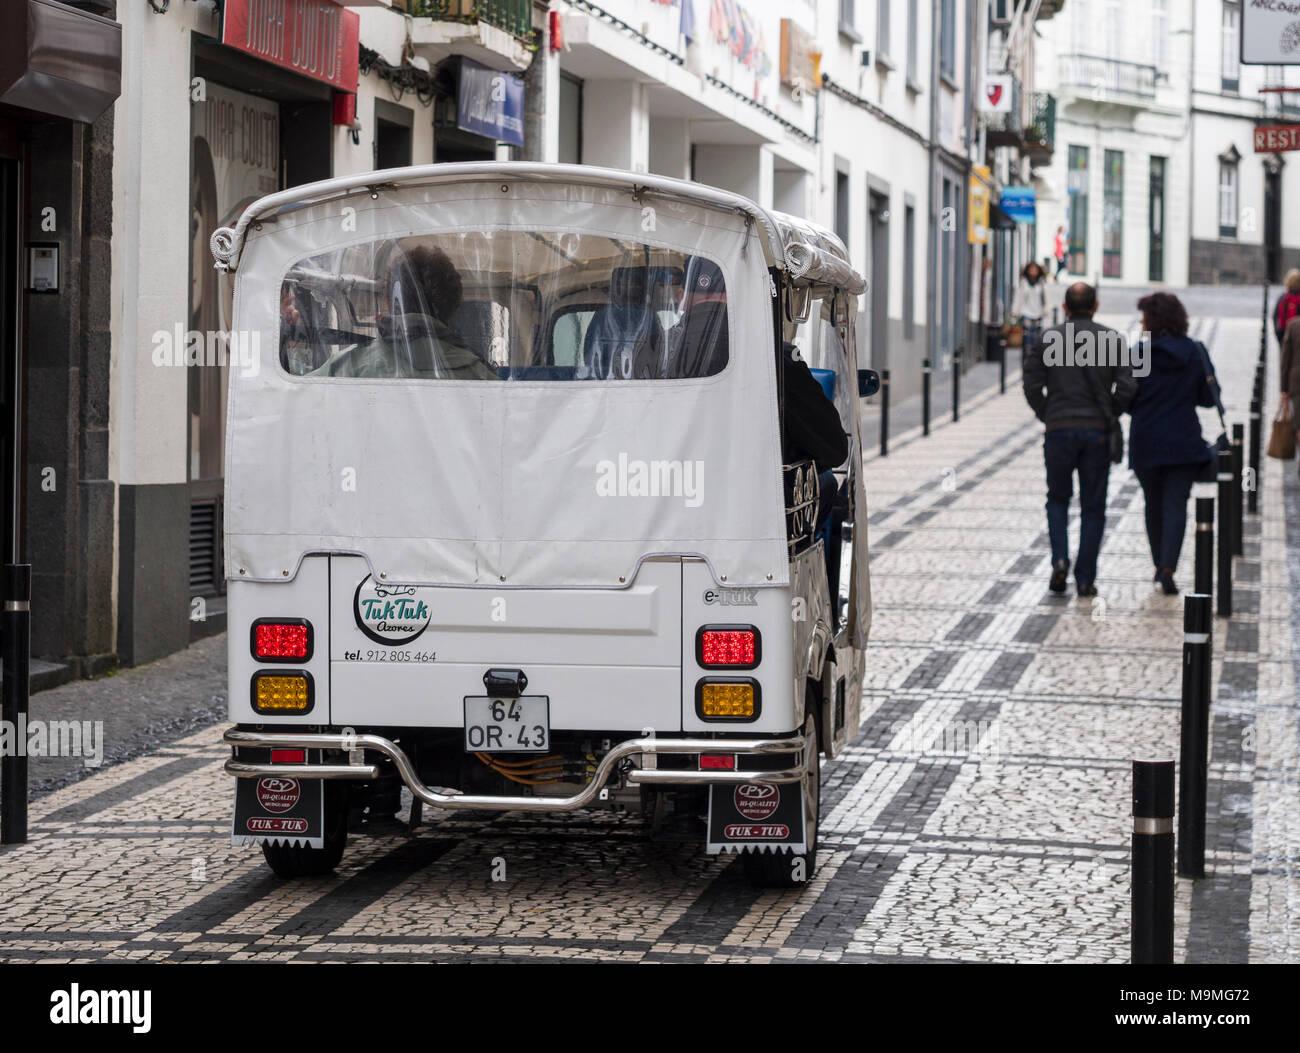 Tuk Tuk Azores: A small 3 wheeled motorbike ferries passengers on the narrow cobbled streets of Ponta Delgada. - Stock Image